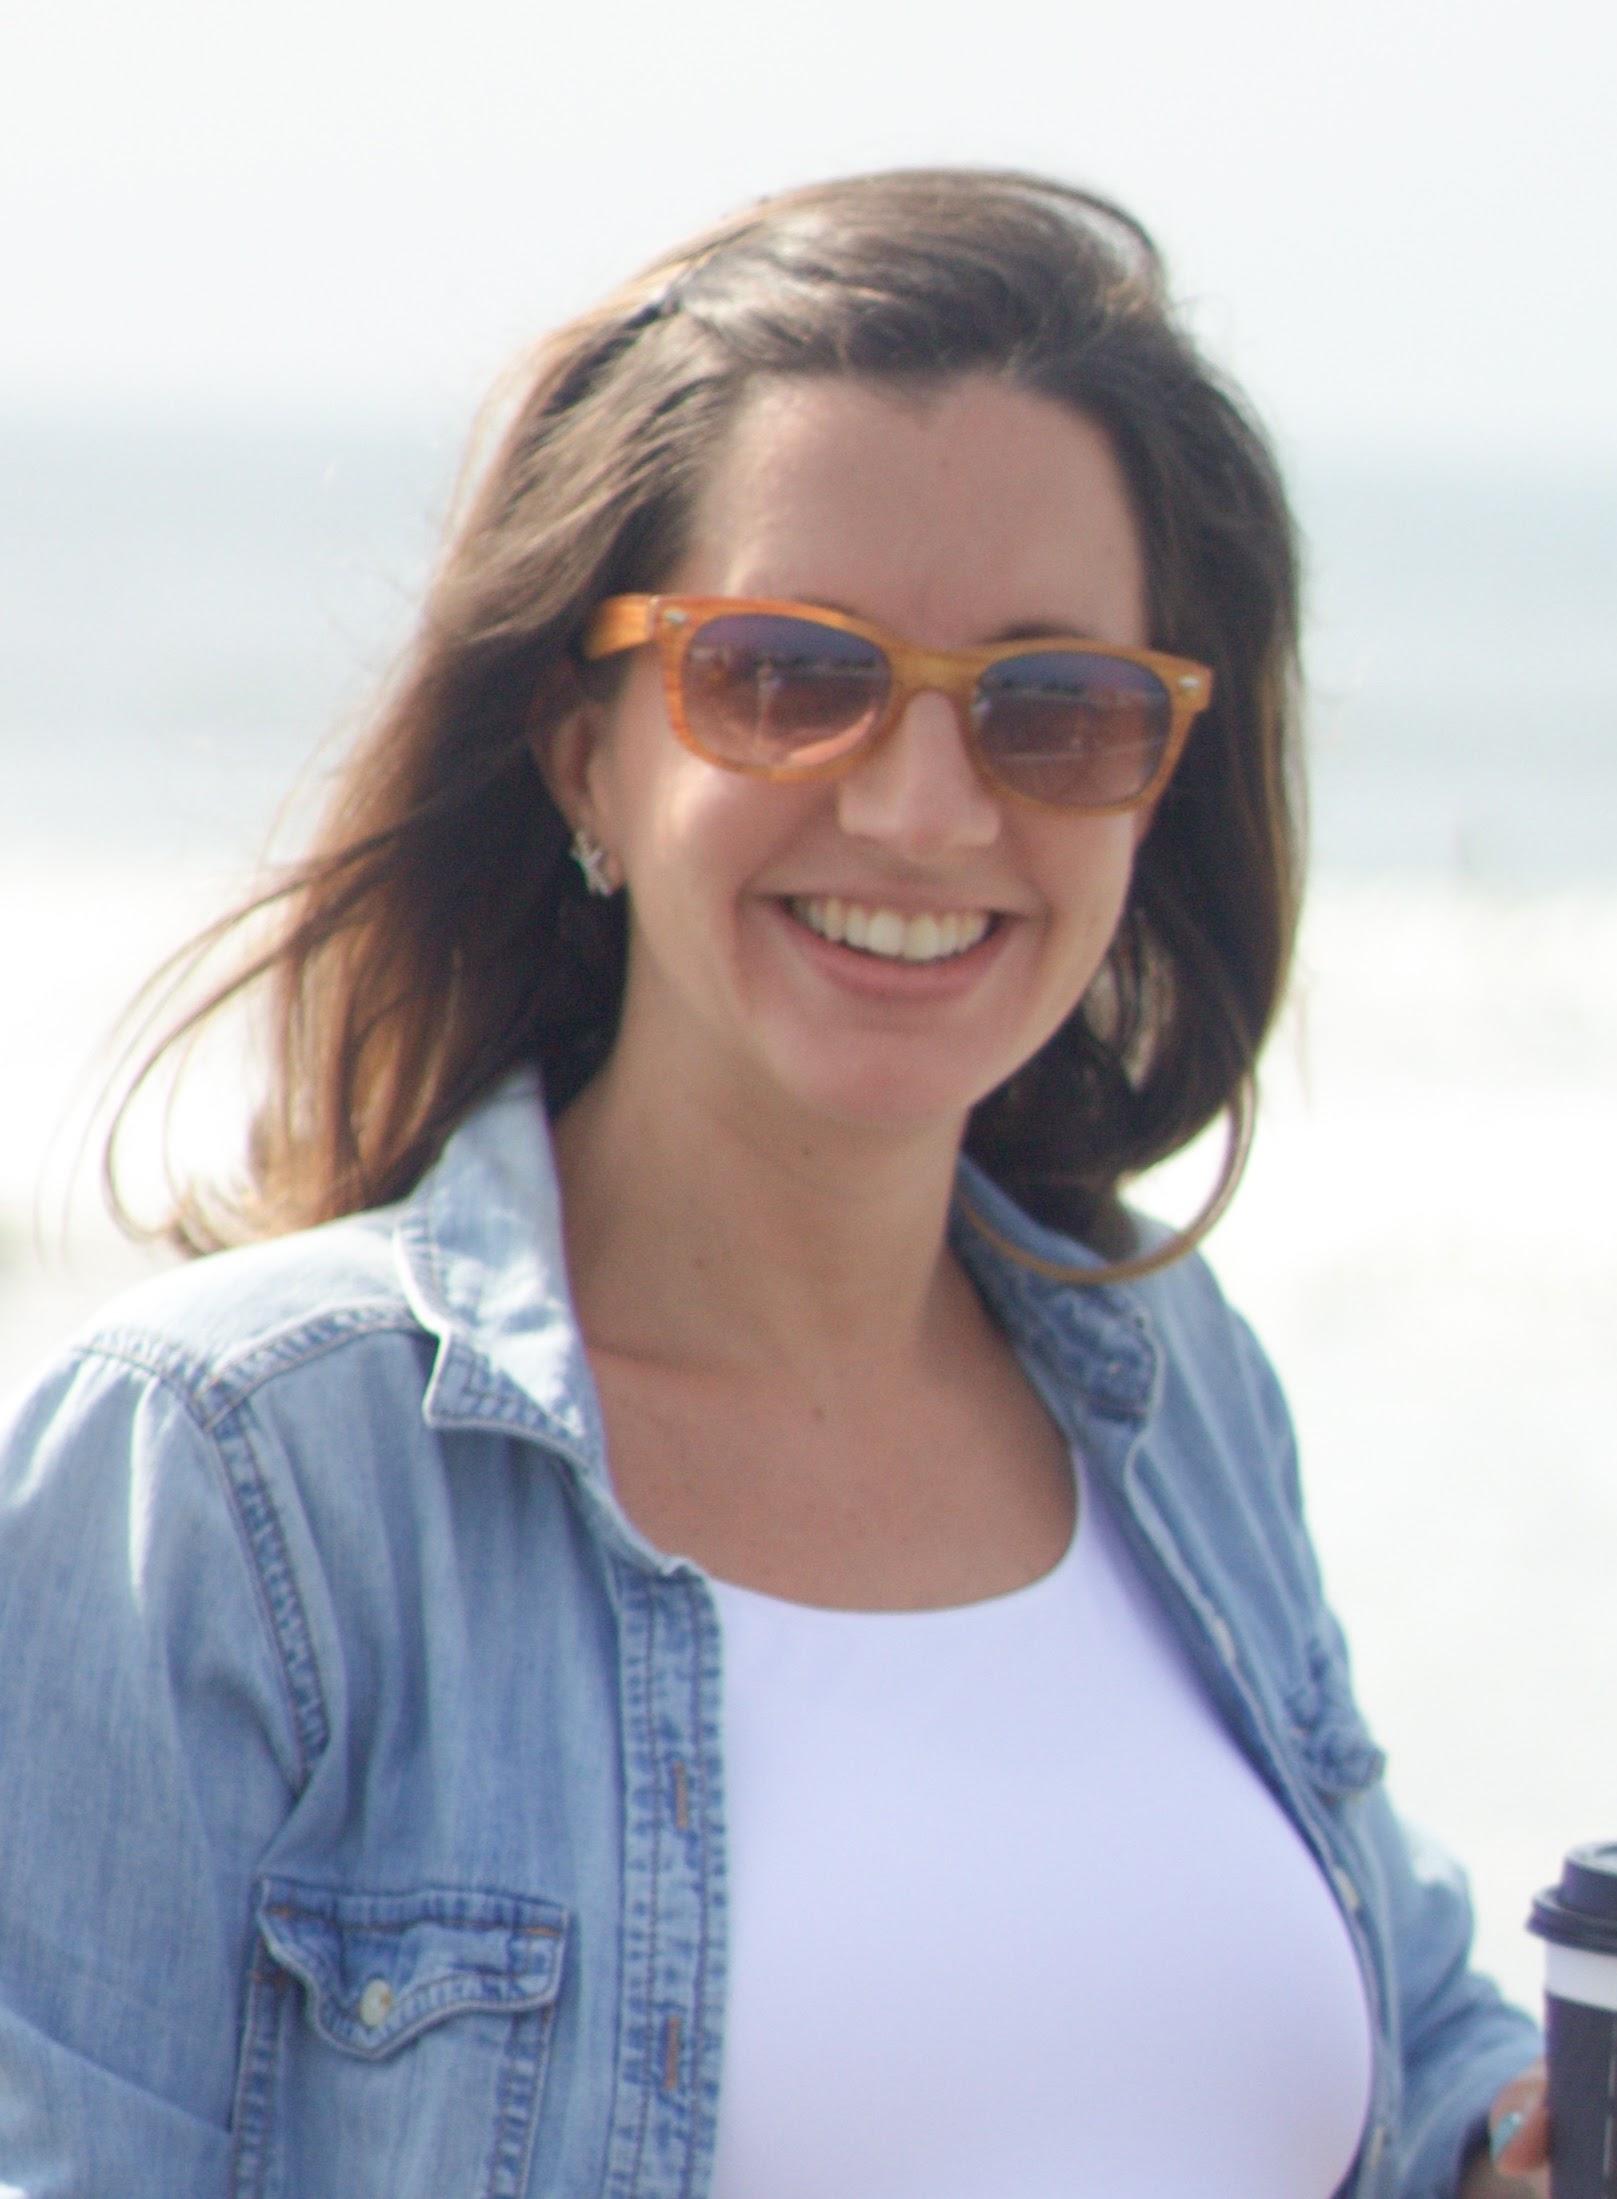 Leah Hallahan